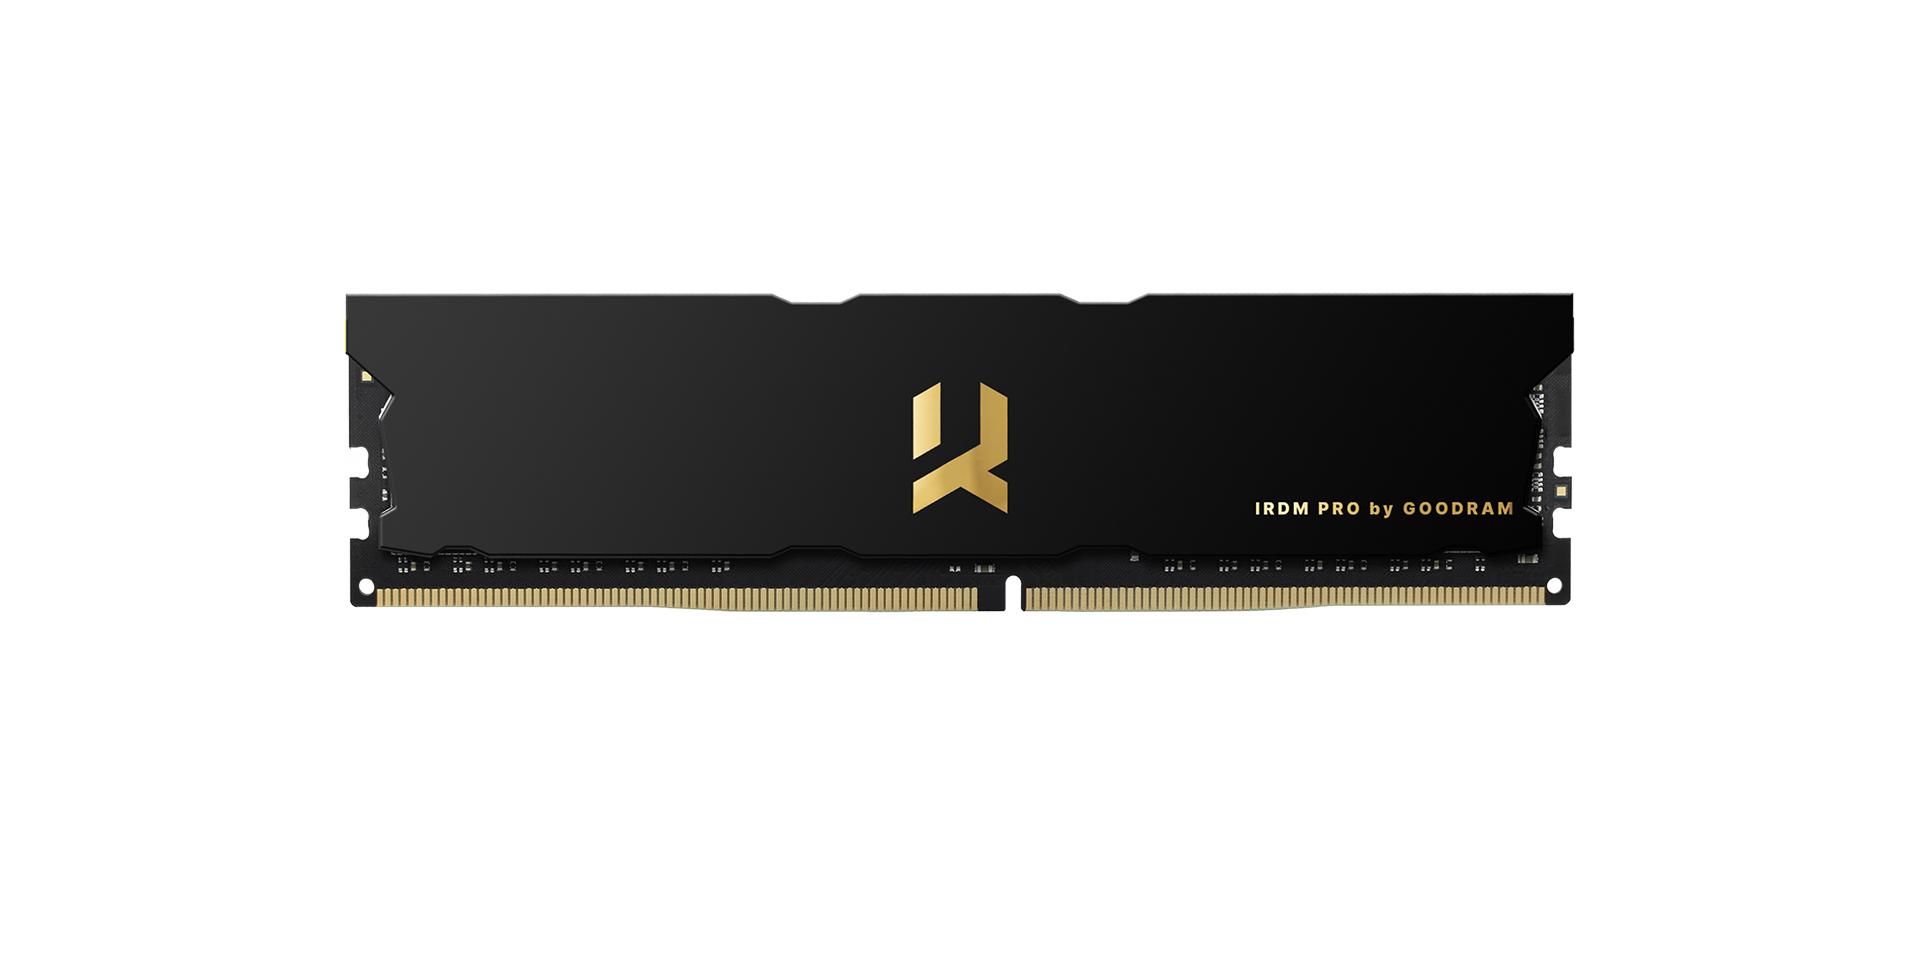 Goodram IRDM PRO DDR4 3600mhz CL17